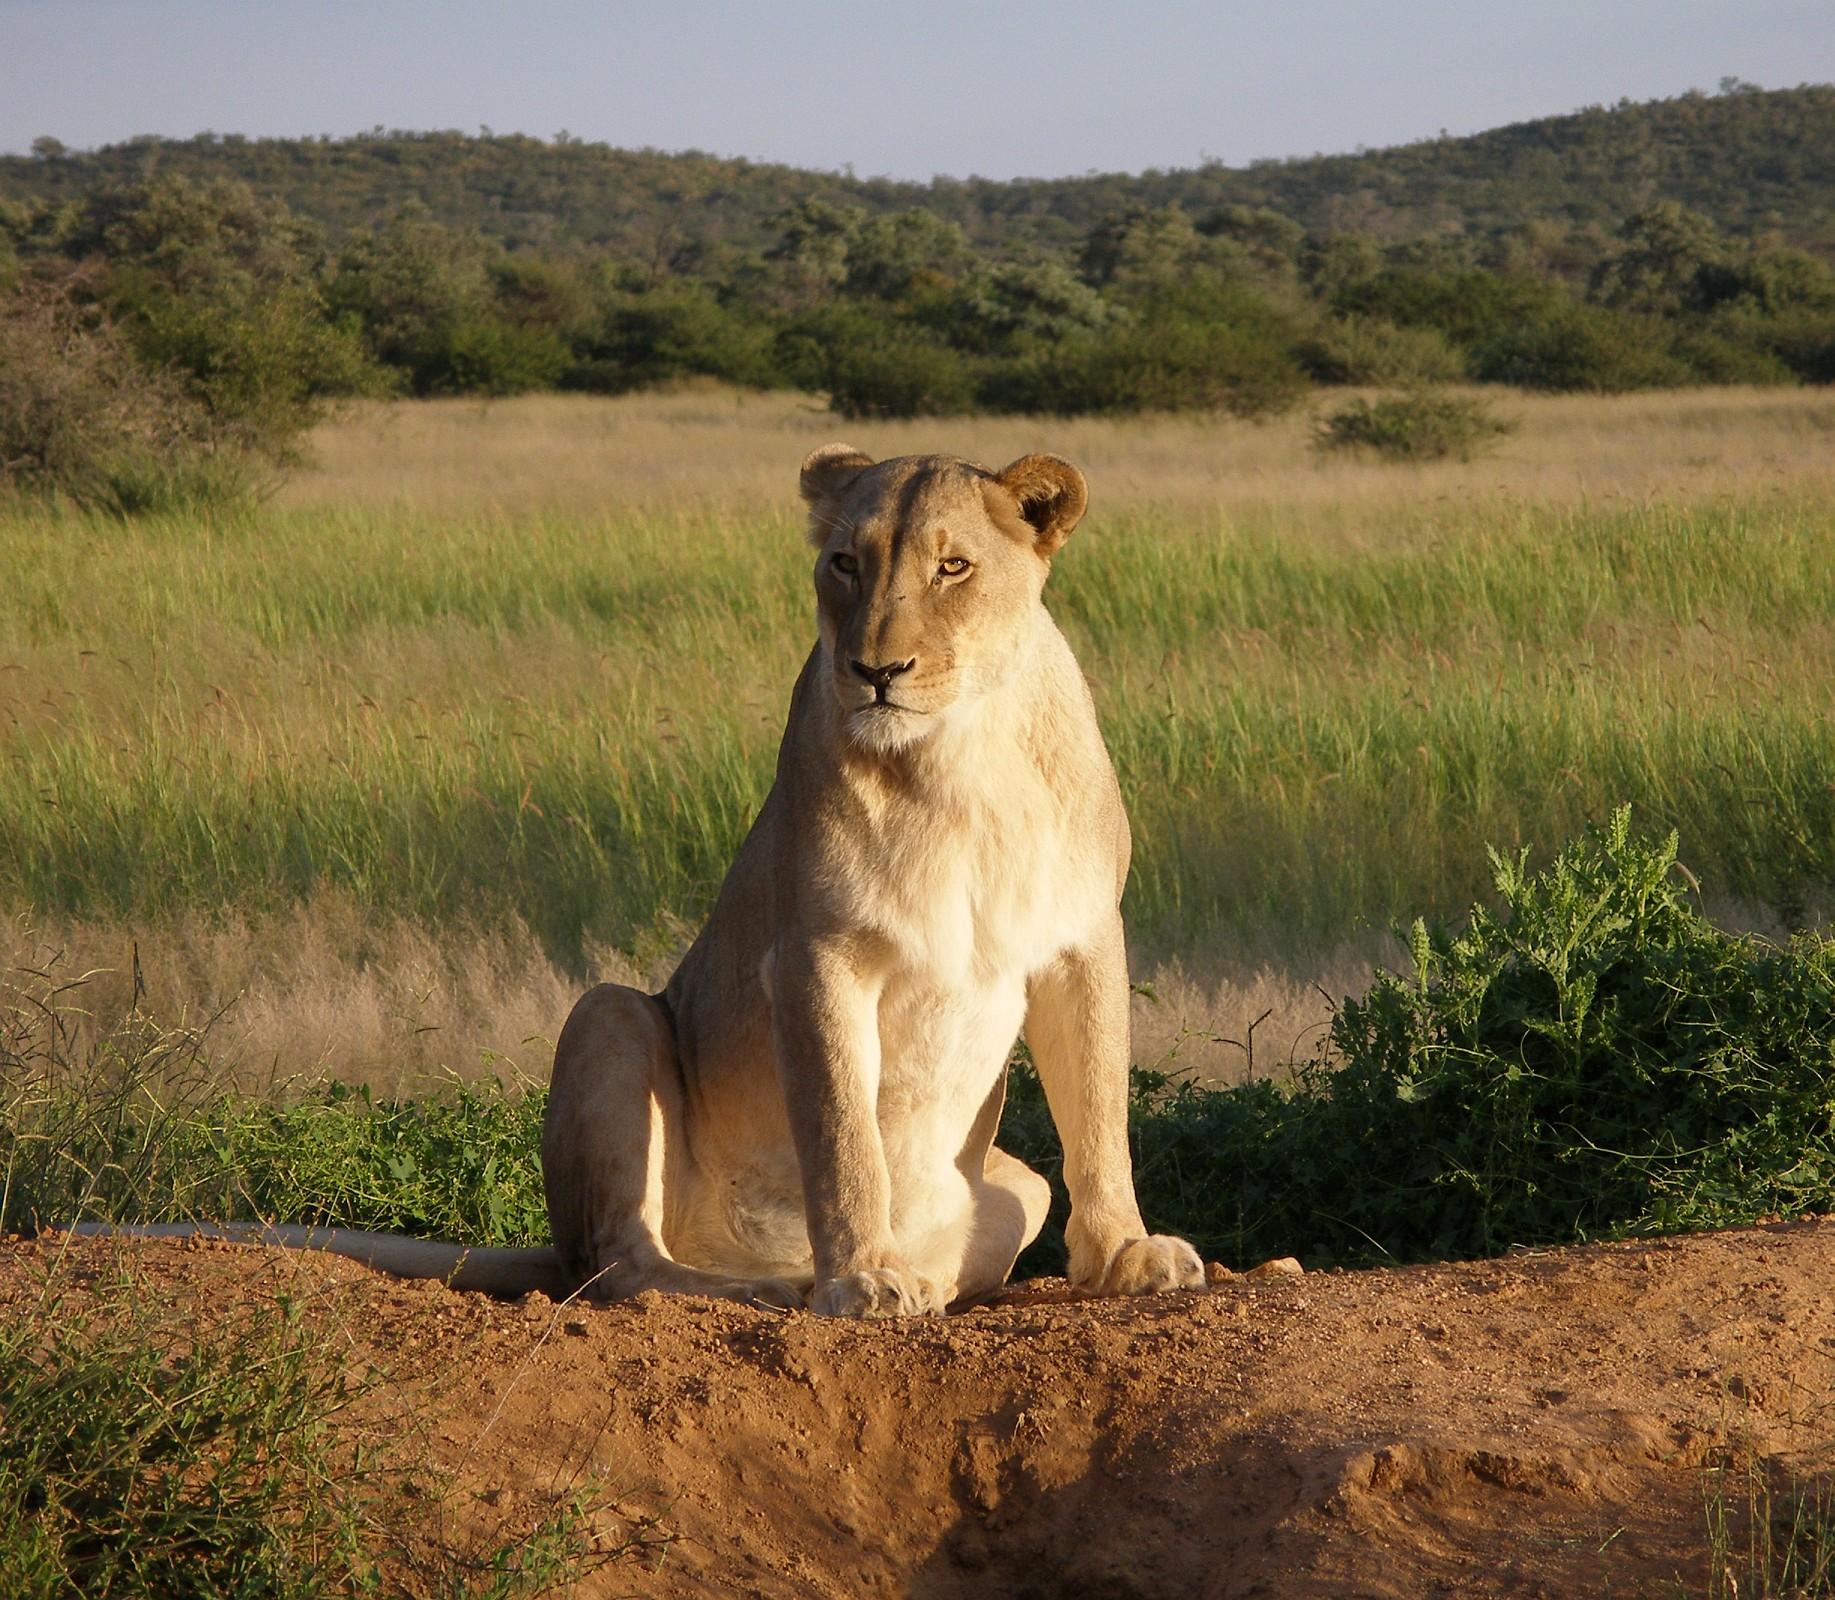 http://upload.wikimedia.org/wikipedia/commons/c/c6/Okonjima_Lioness.jpg